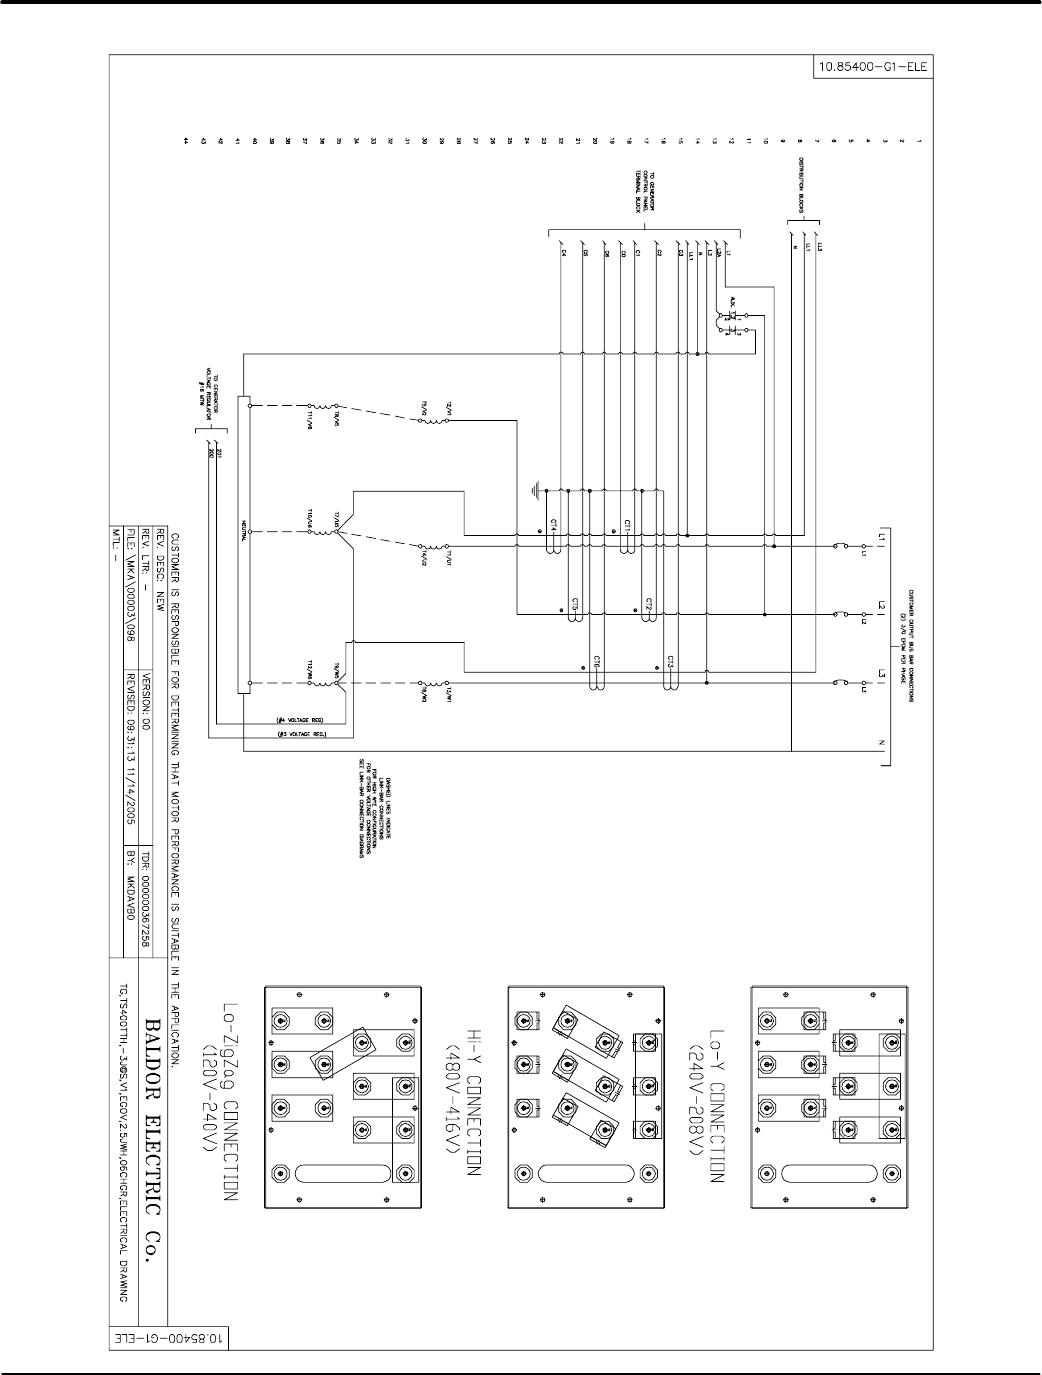 Baldor Ts35 Mn2417 Tier 2 3 Towable Generators User Manual To The High Efficiency Wiring Diagram A 32 Diagrams